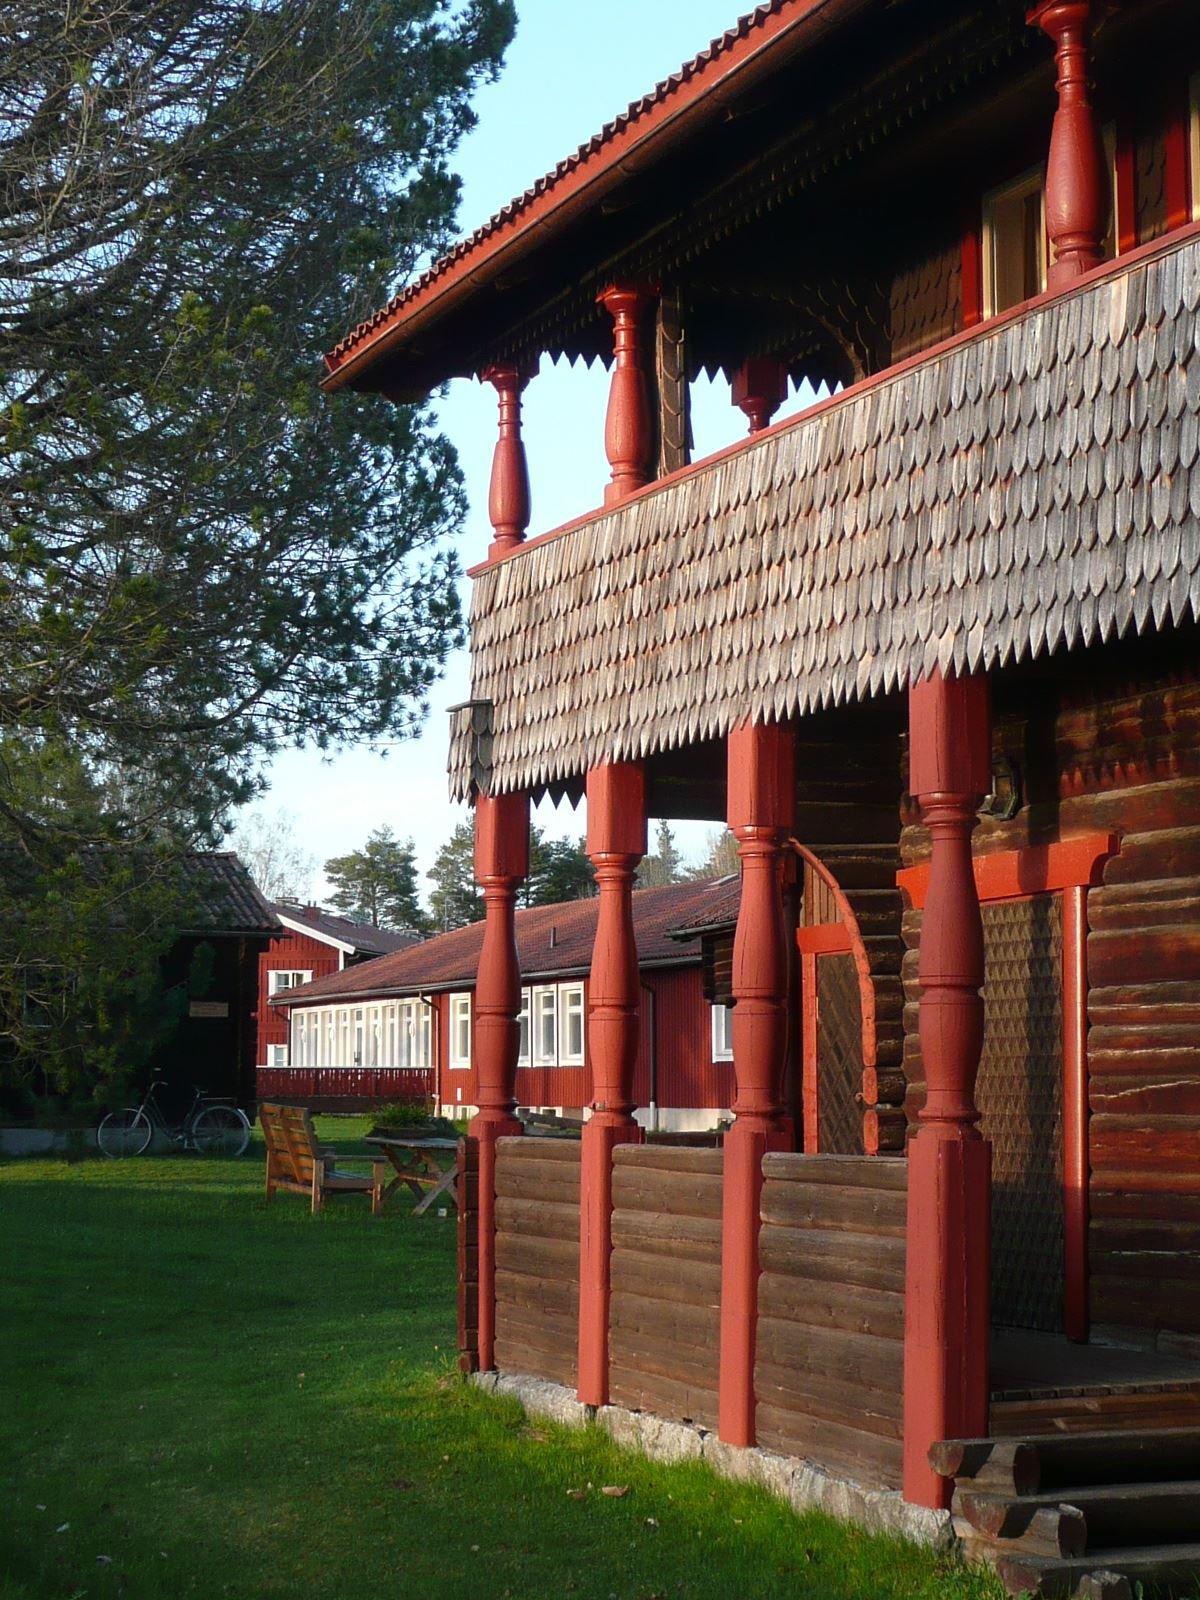 Leksands Folkhögskola, Leksand - Youth Hostel